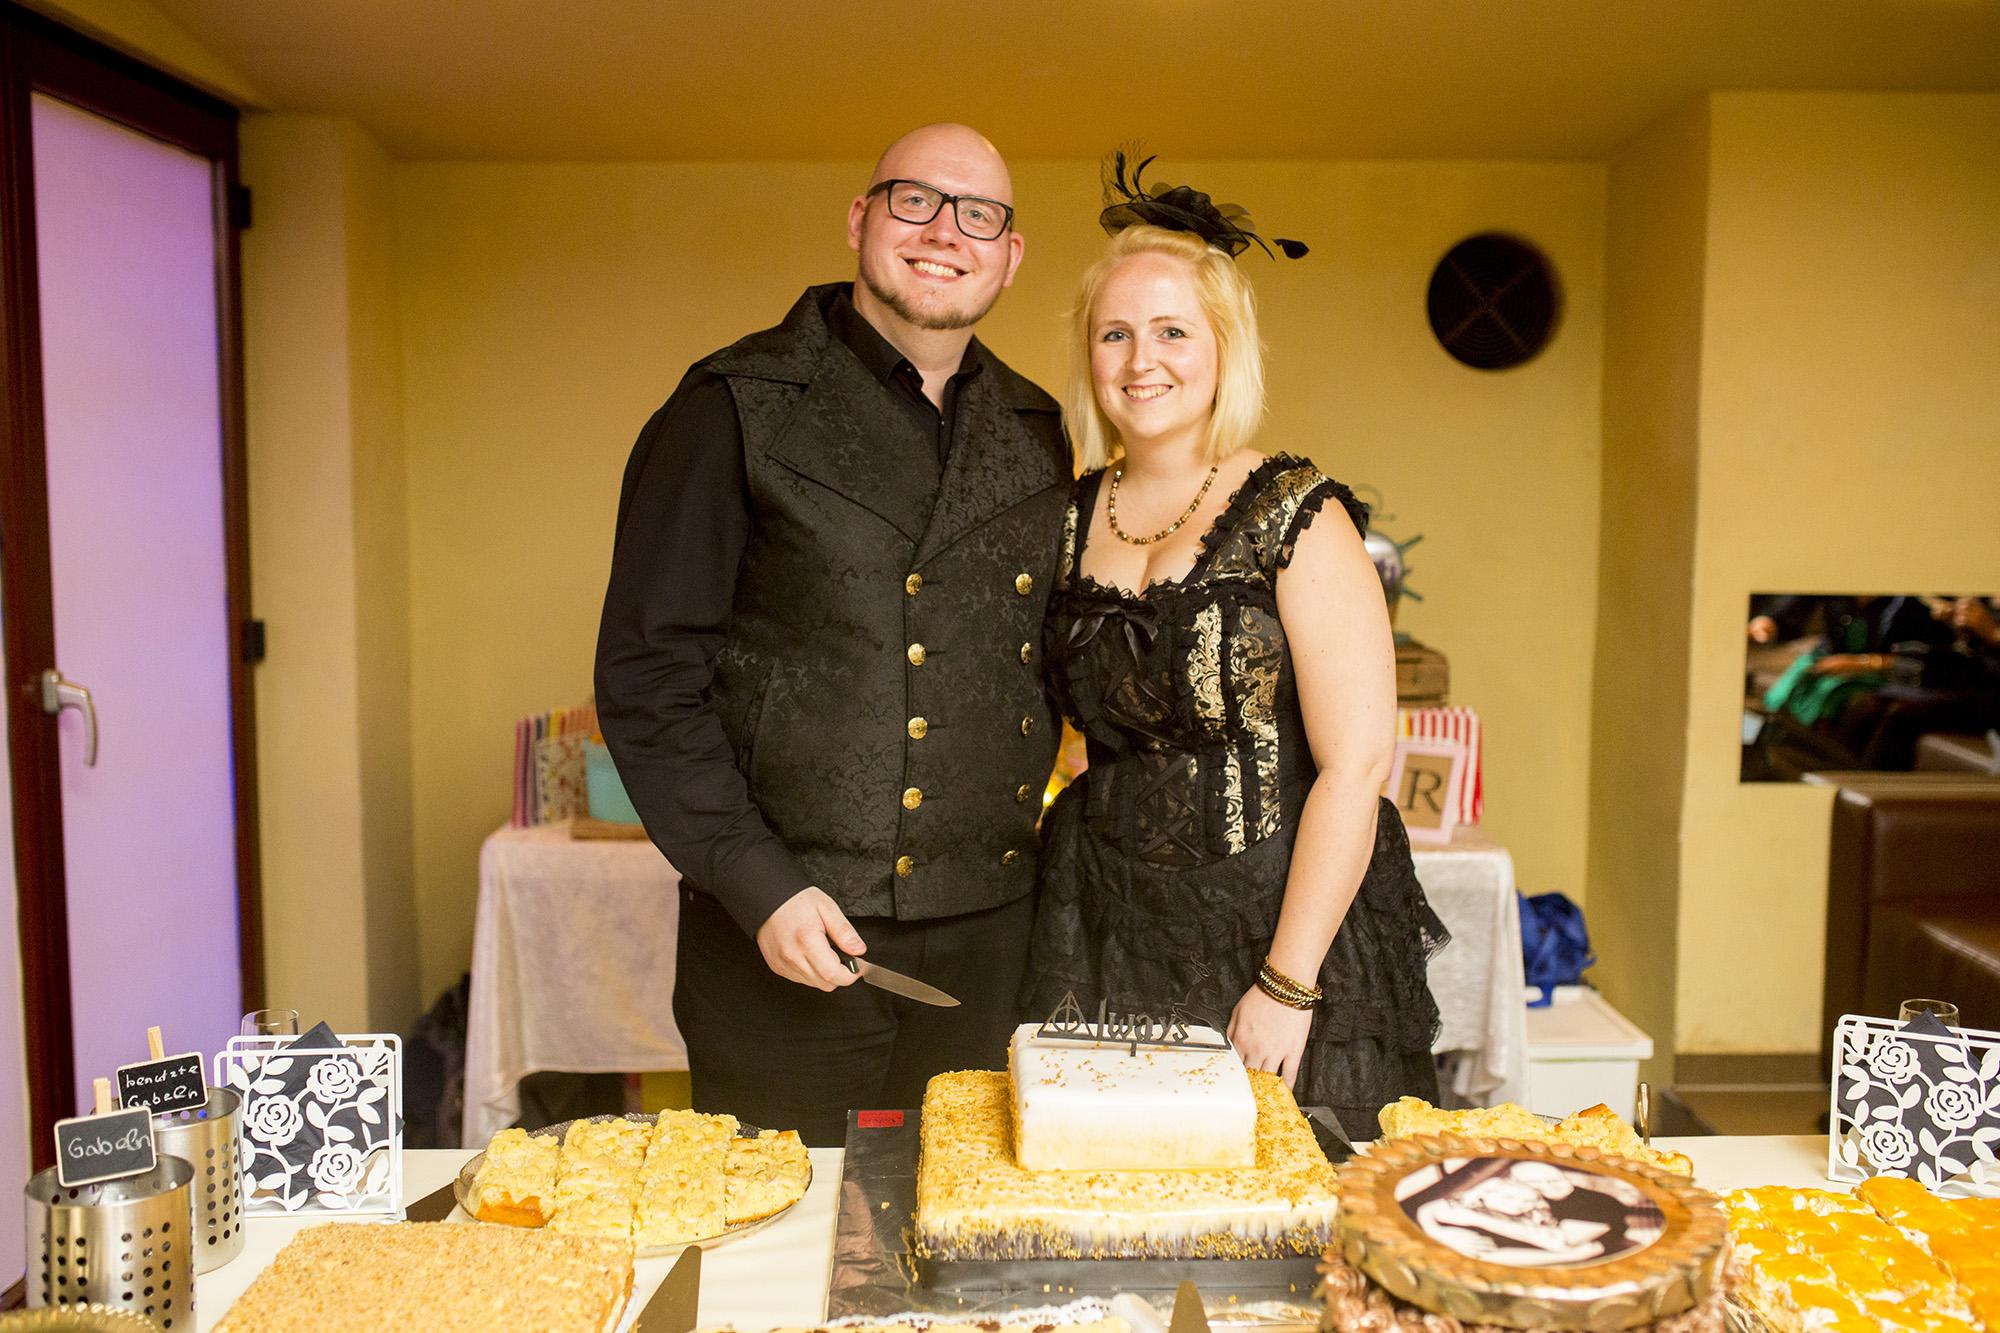 Seriously_Sabrina_Photography_Essen_Germany_RocknRoll_Hochzeit_Wedding_PatrickJenny93.jpg